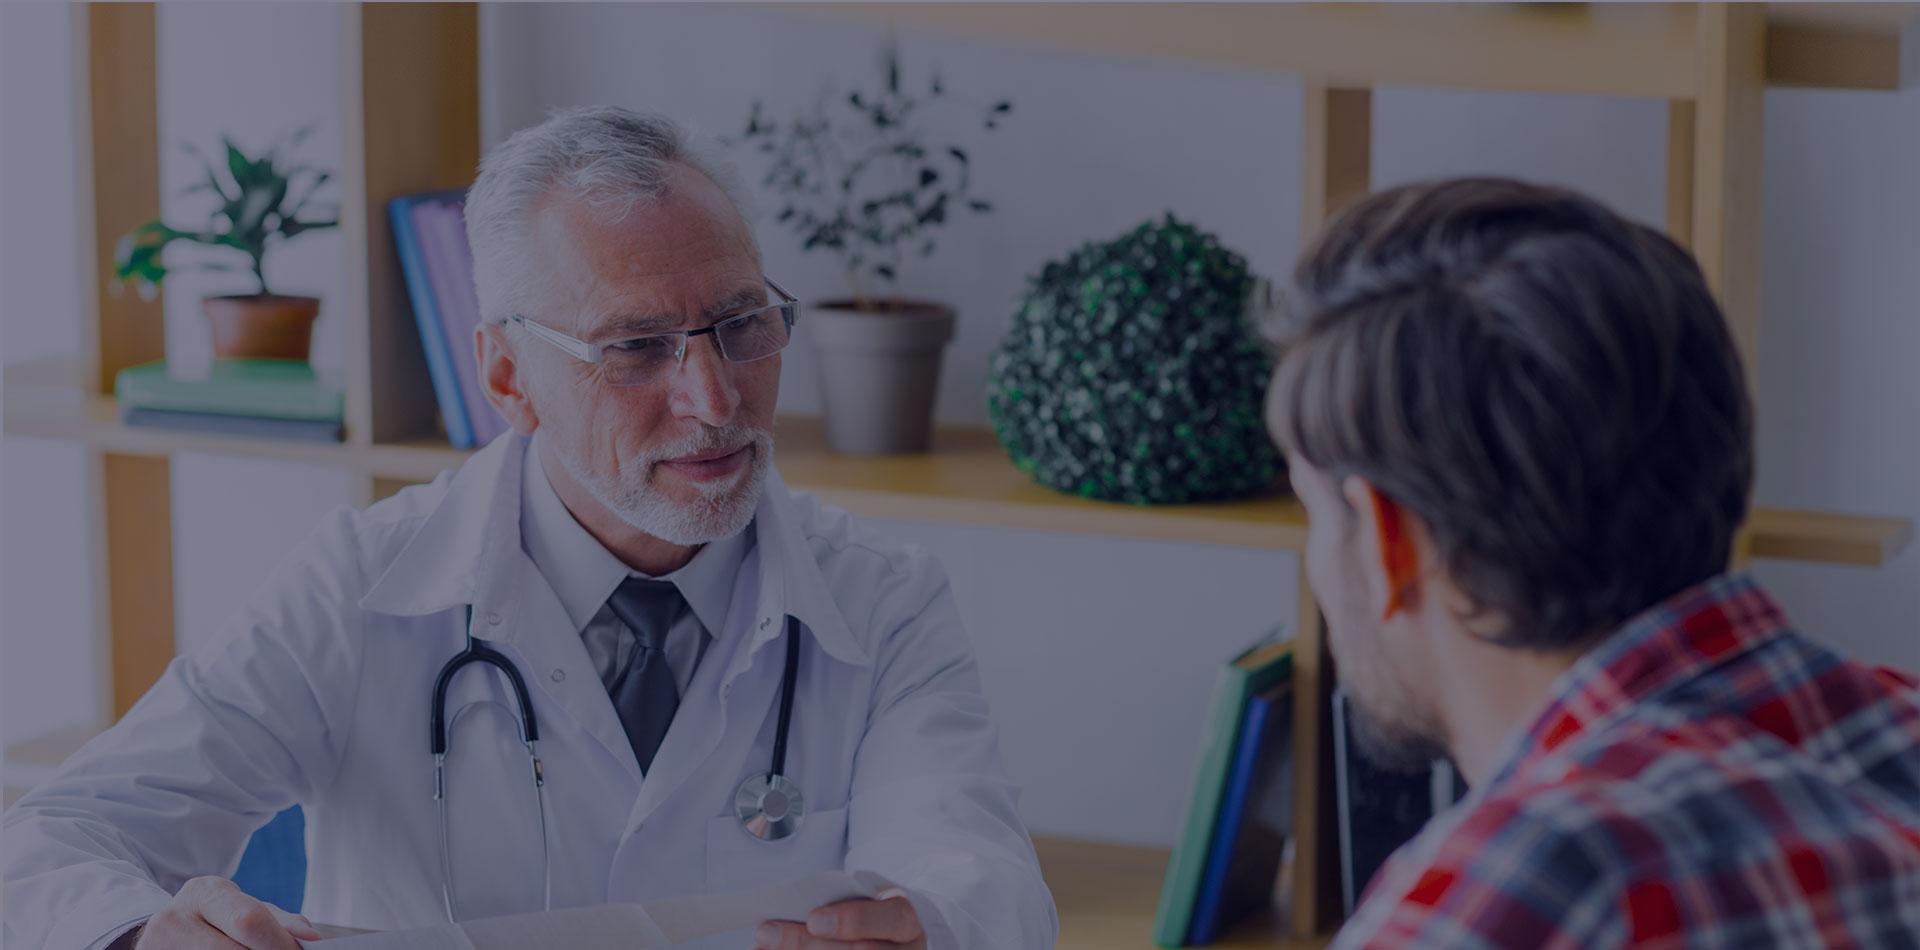 Patient Engagement Software Solutions | Patient Centered Care Solutions